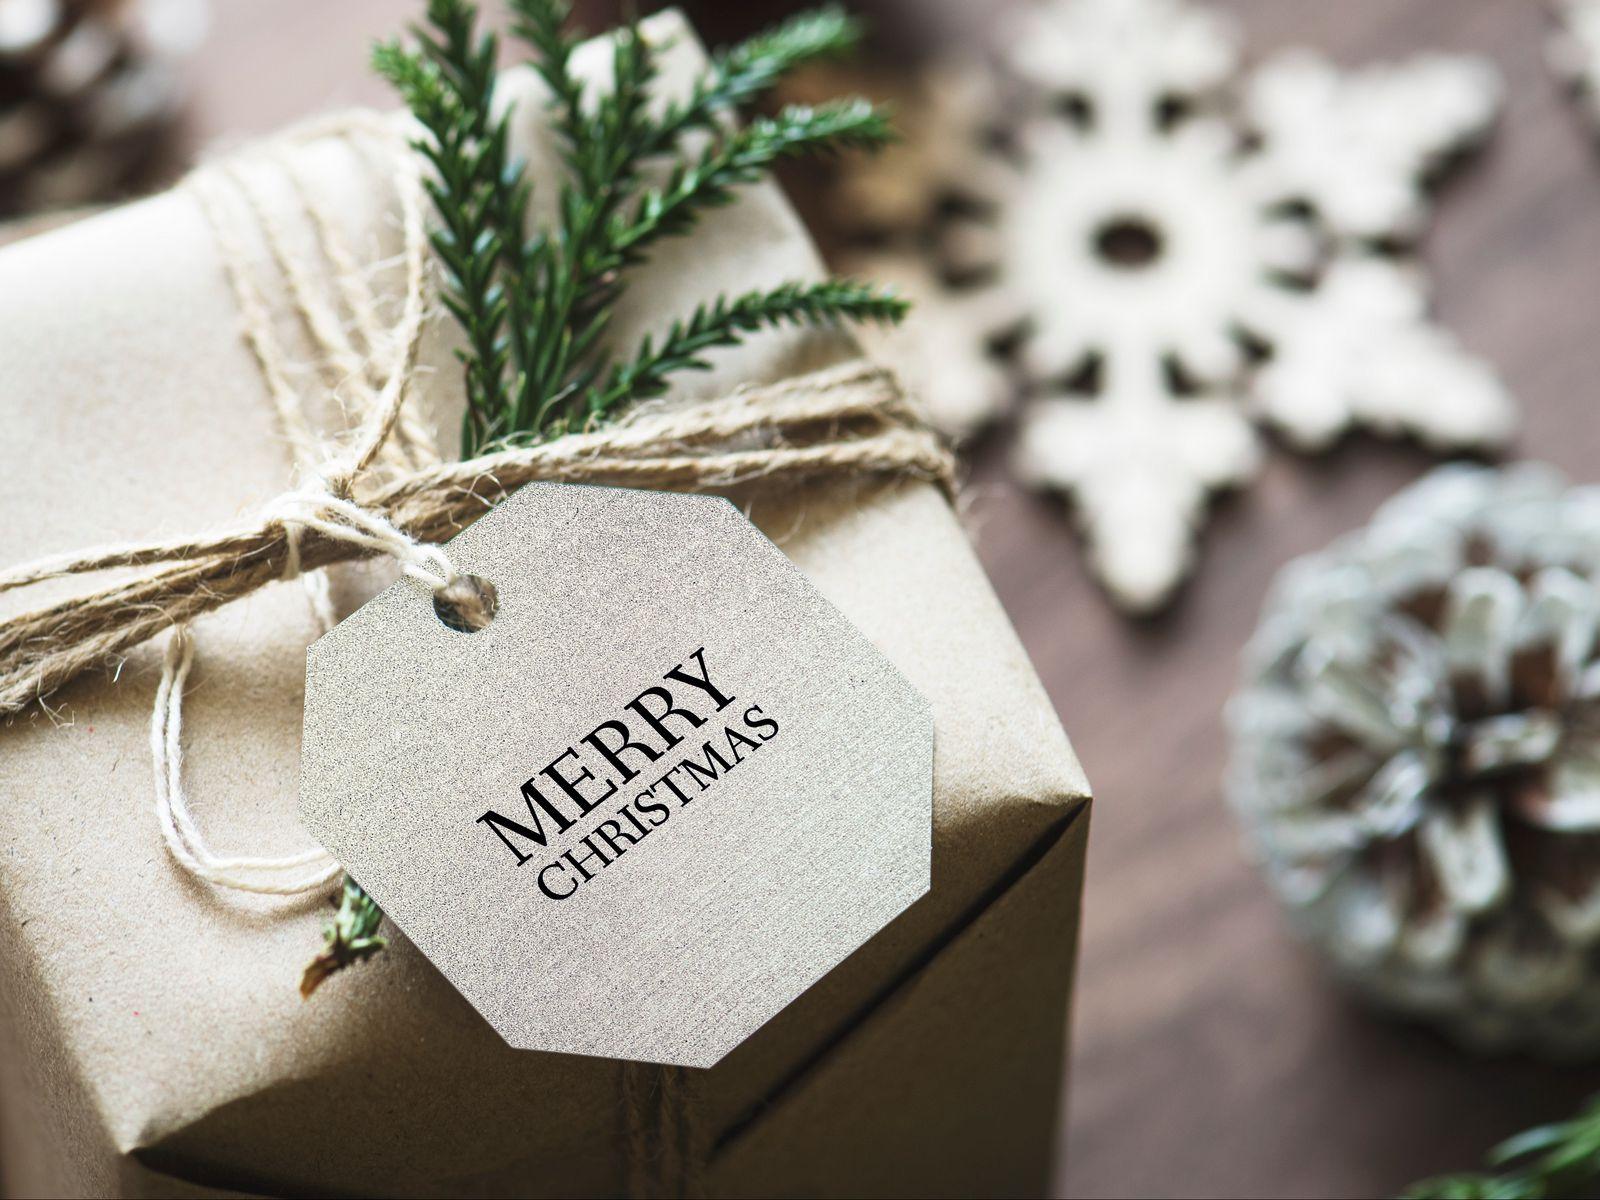 1600x1200 Wallpaper gift, christmas, new year, tag, box